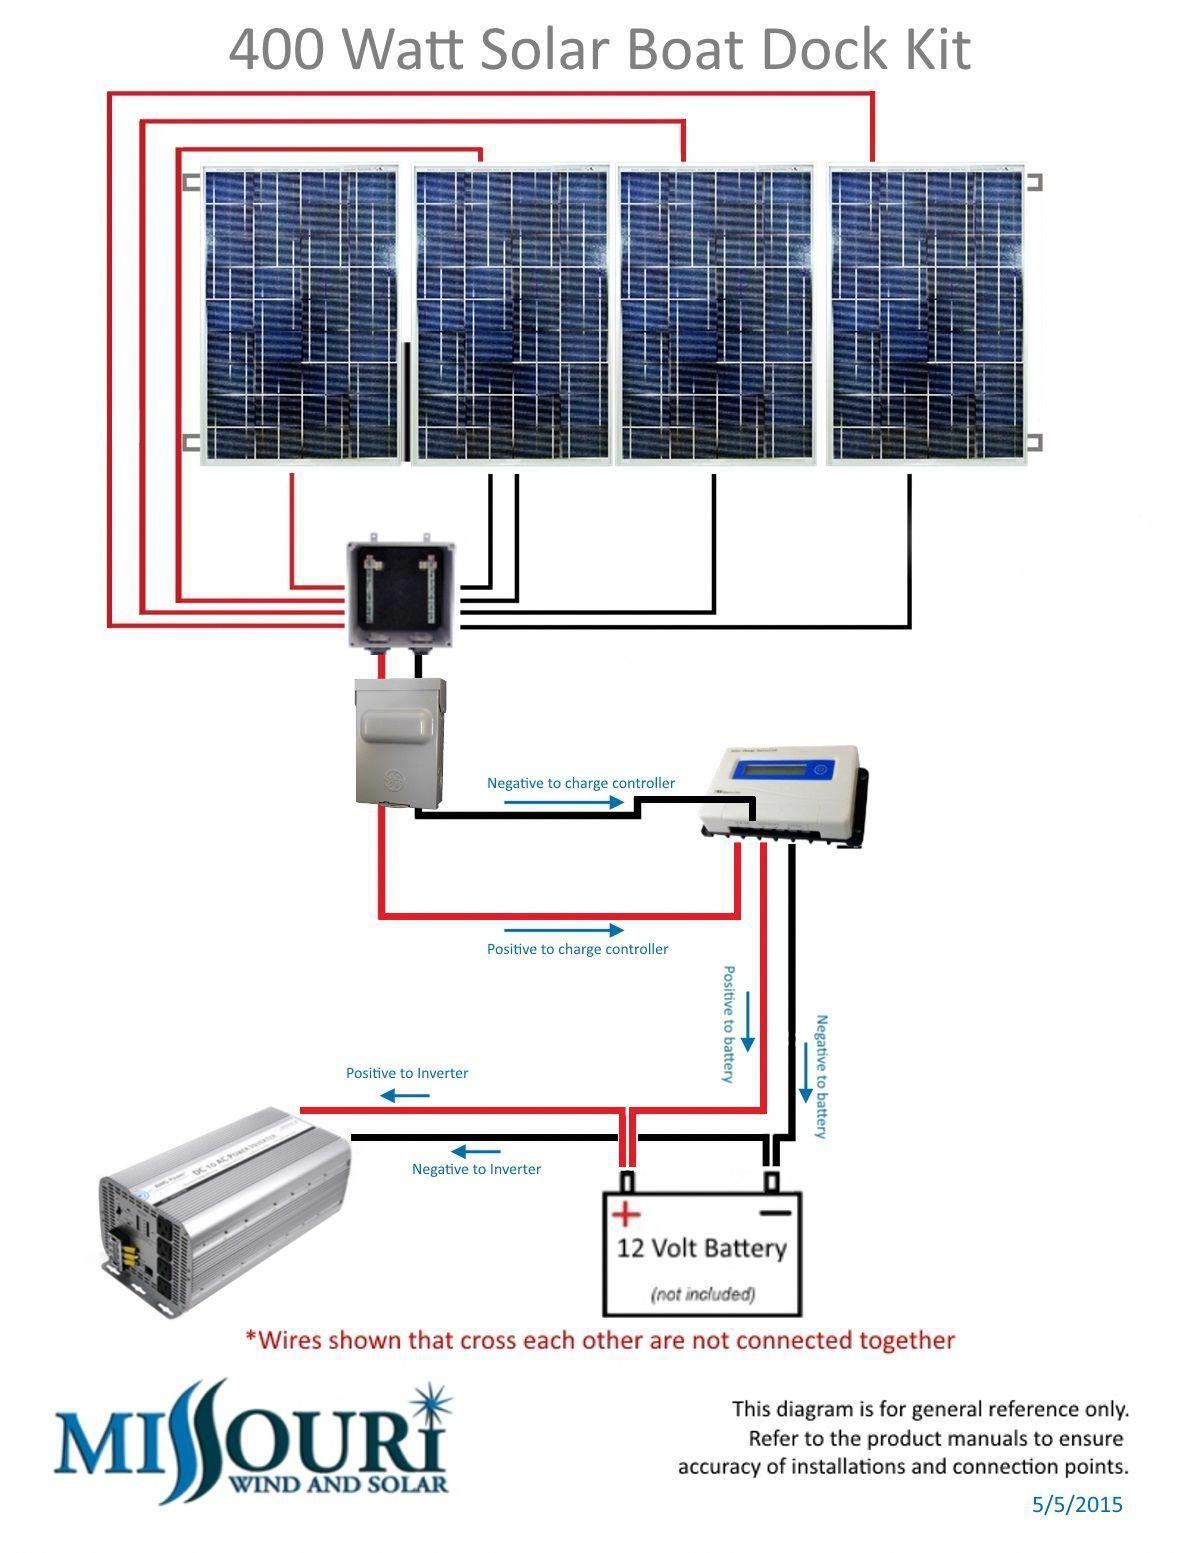 200 Watt Solar Panel Kit With Optional Mounting Hardware In 2020 Solar Panel Kits Solar Panels Best Solar Panels